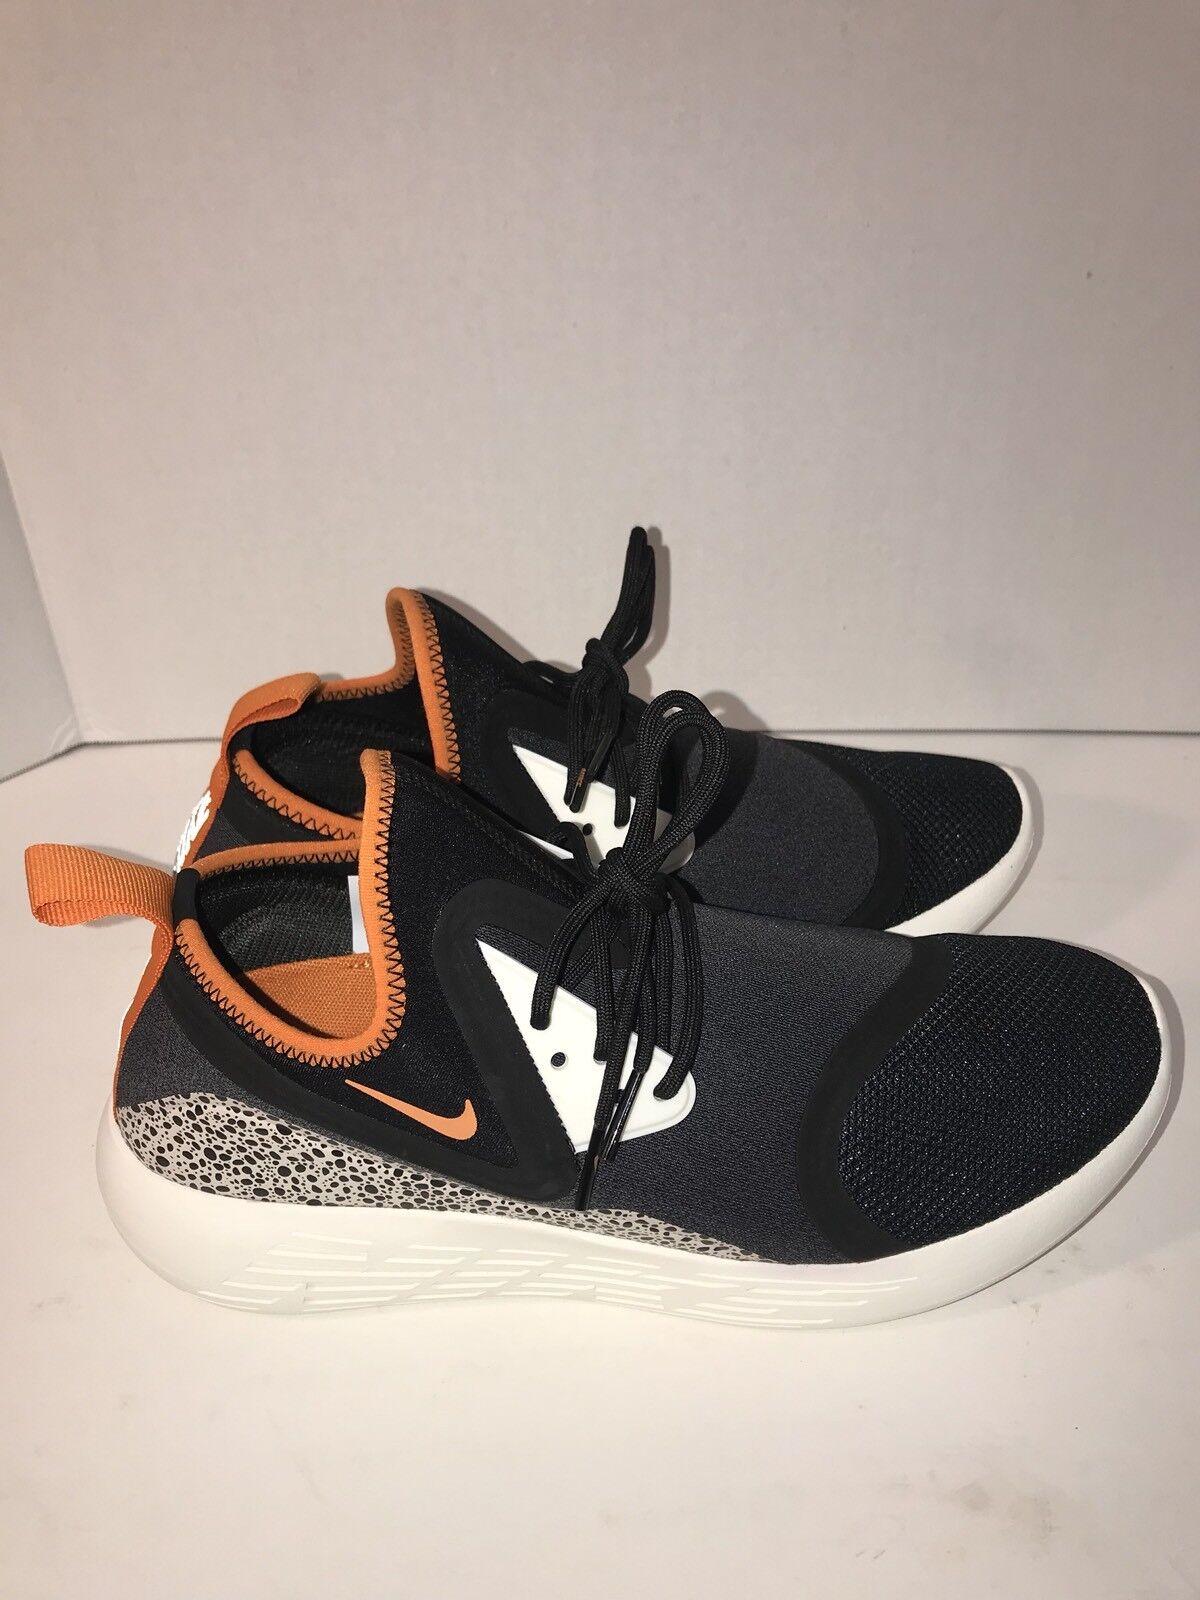 Cheap women's shoes women's shoes NIKE Lunarcharge BN black white orange safari 933811-081 Price reduction